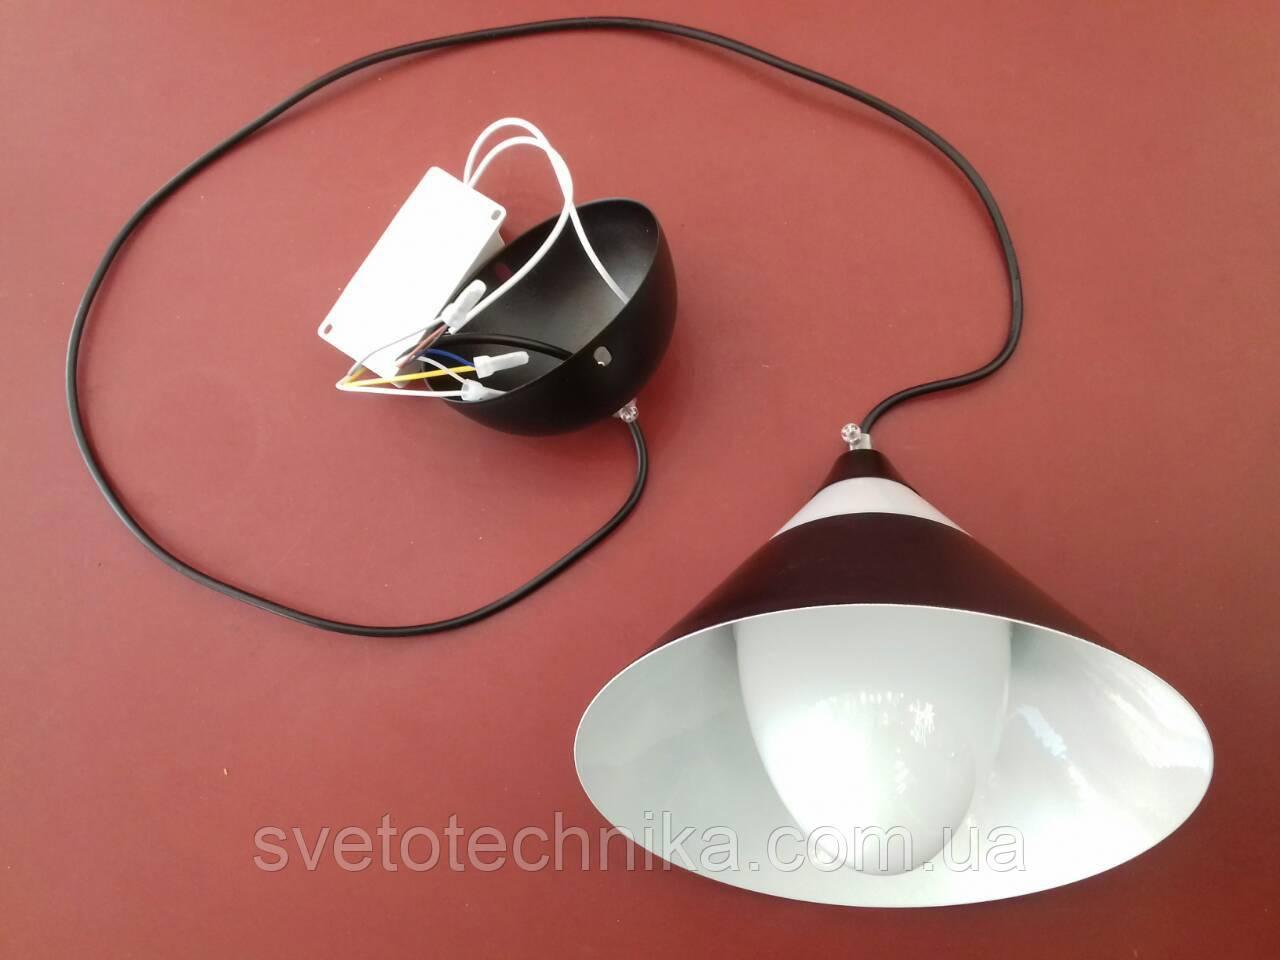 Светильник конус на проводе шнуре